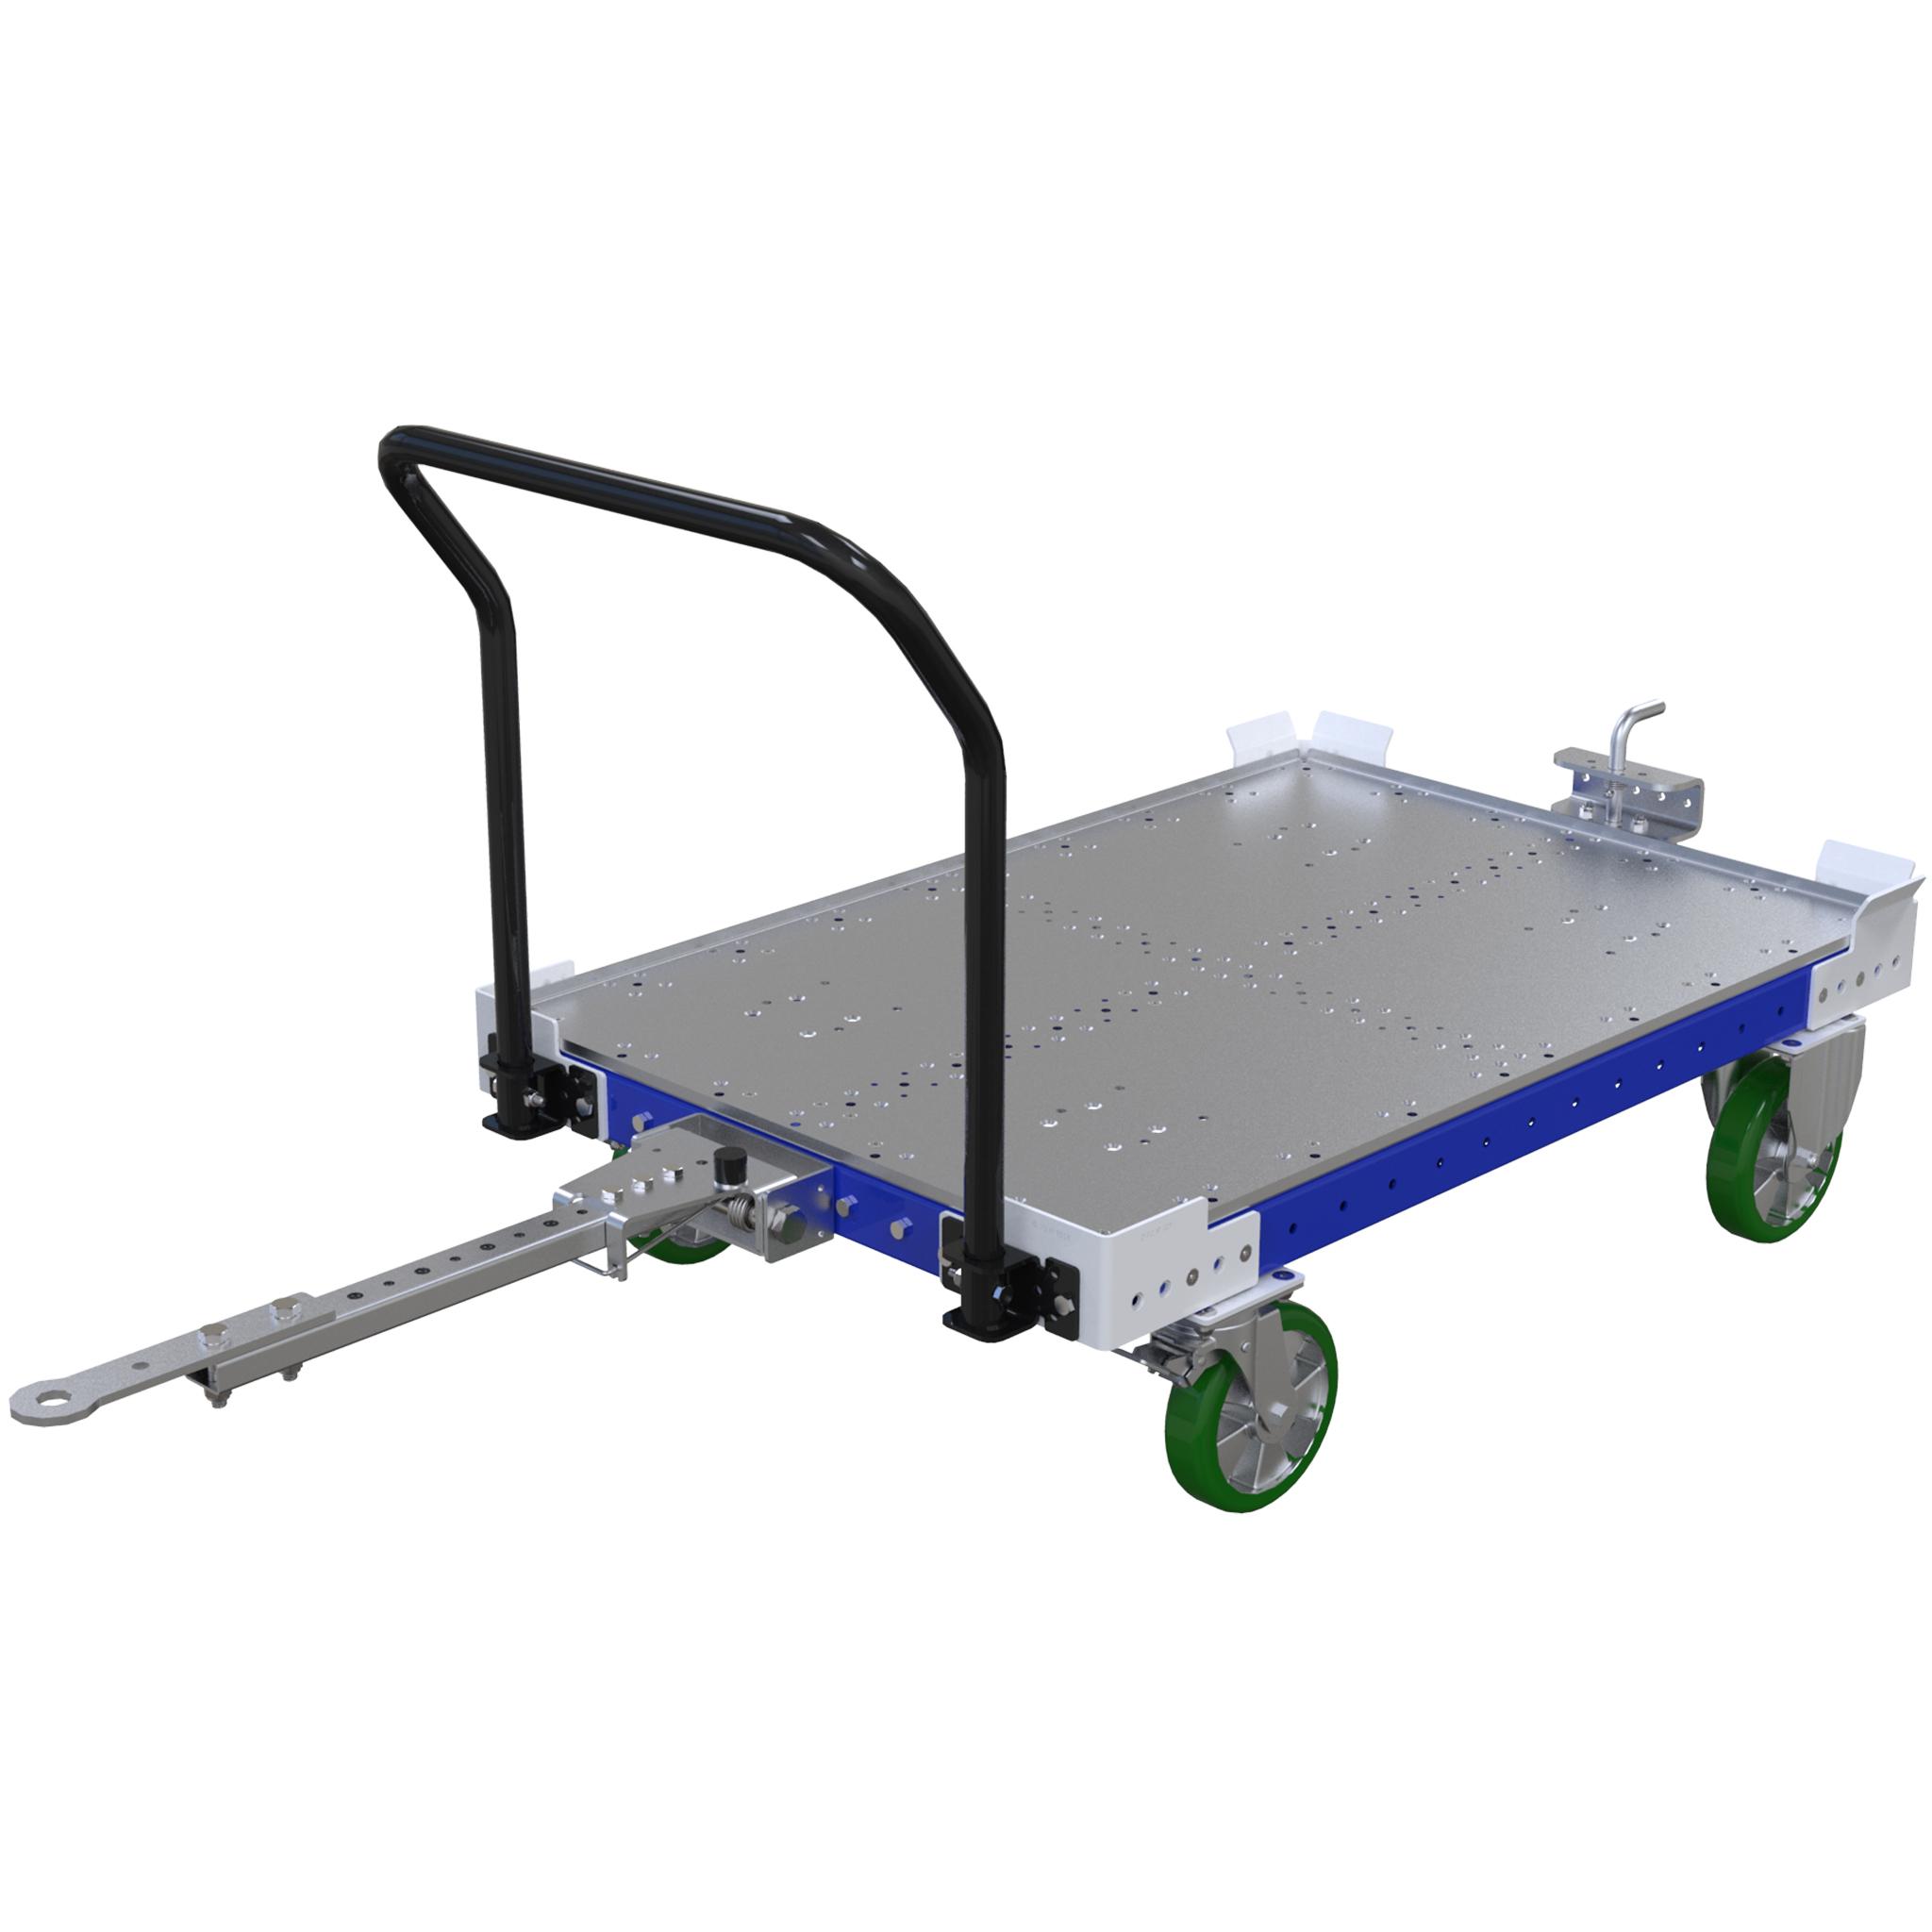 Tugger Cart (Heavy duty)- 1260 x 840 mm